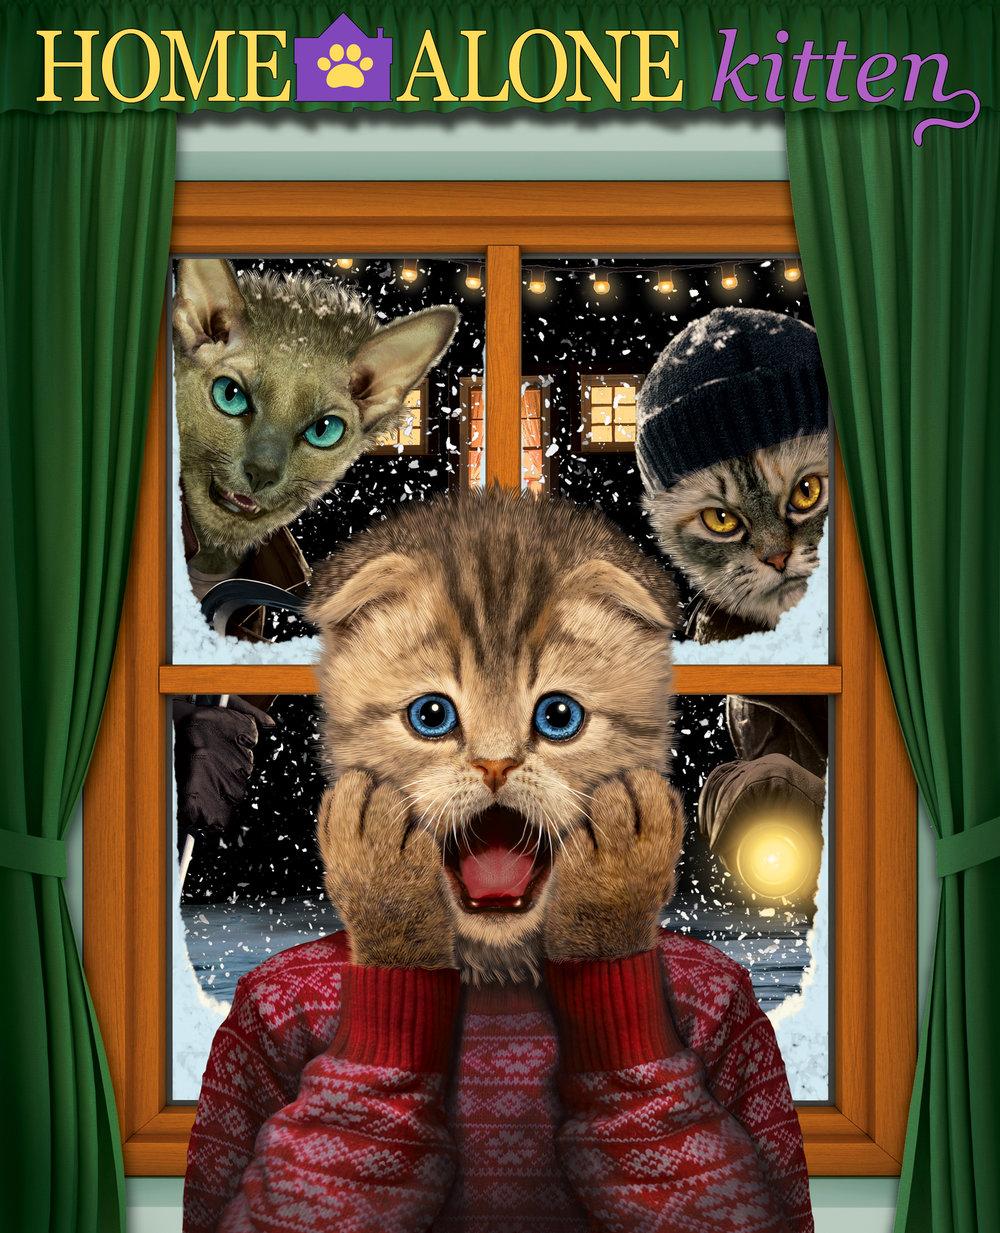 Home Alone Kitten.jpg